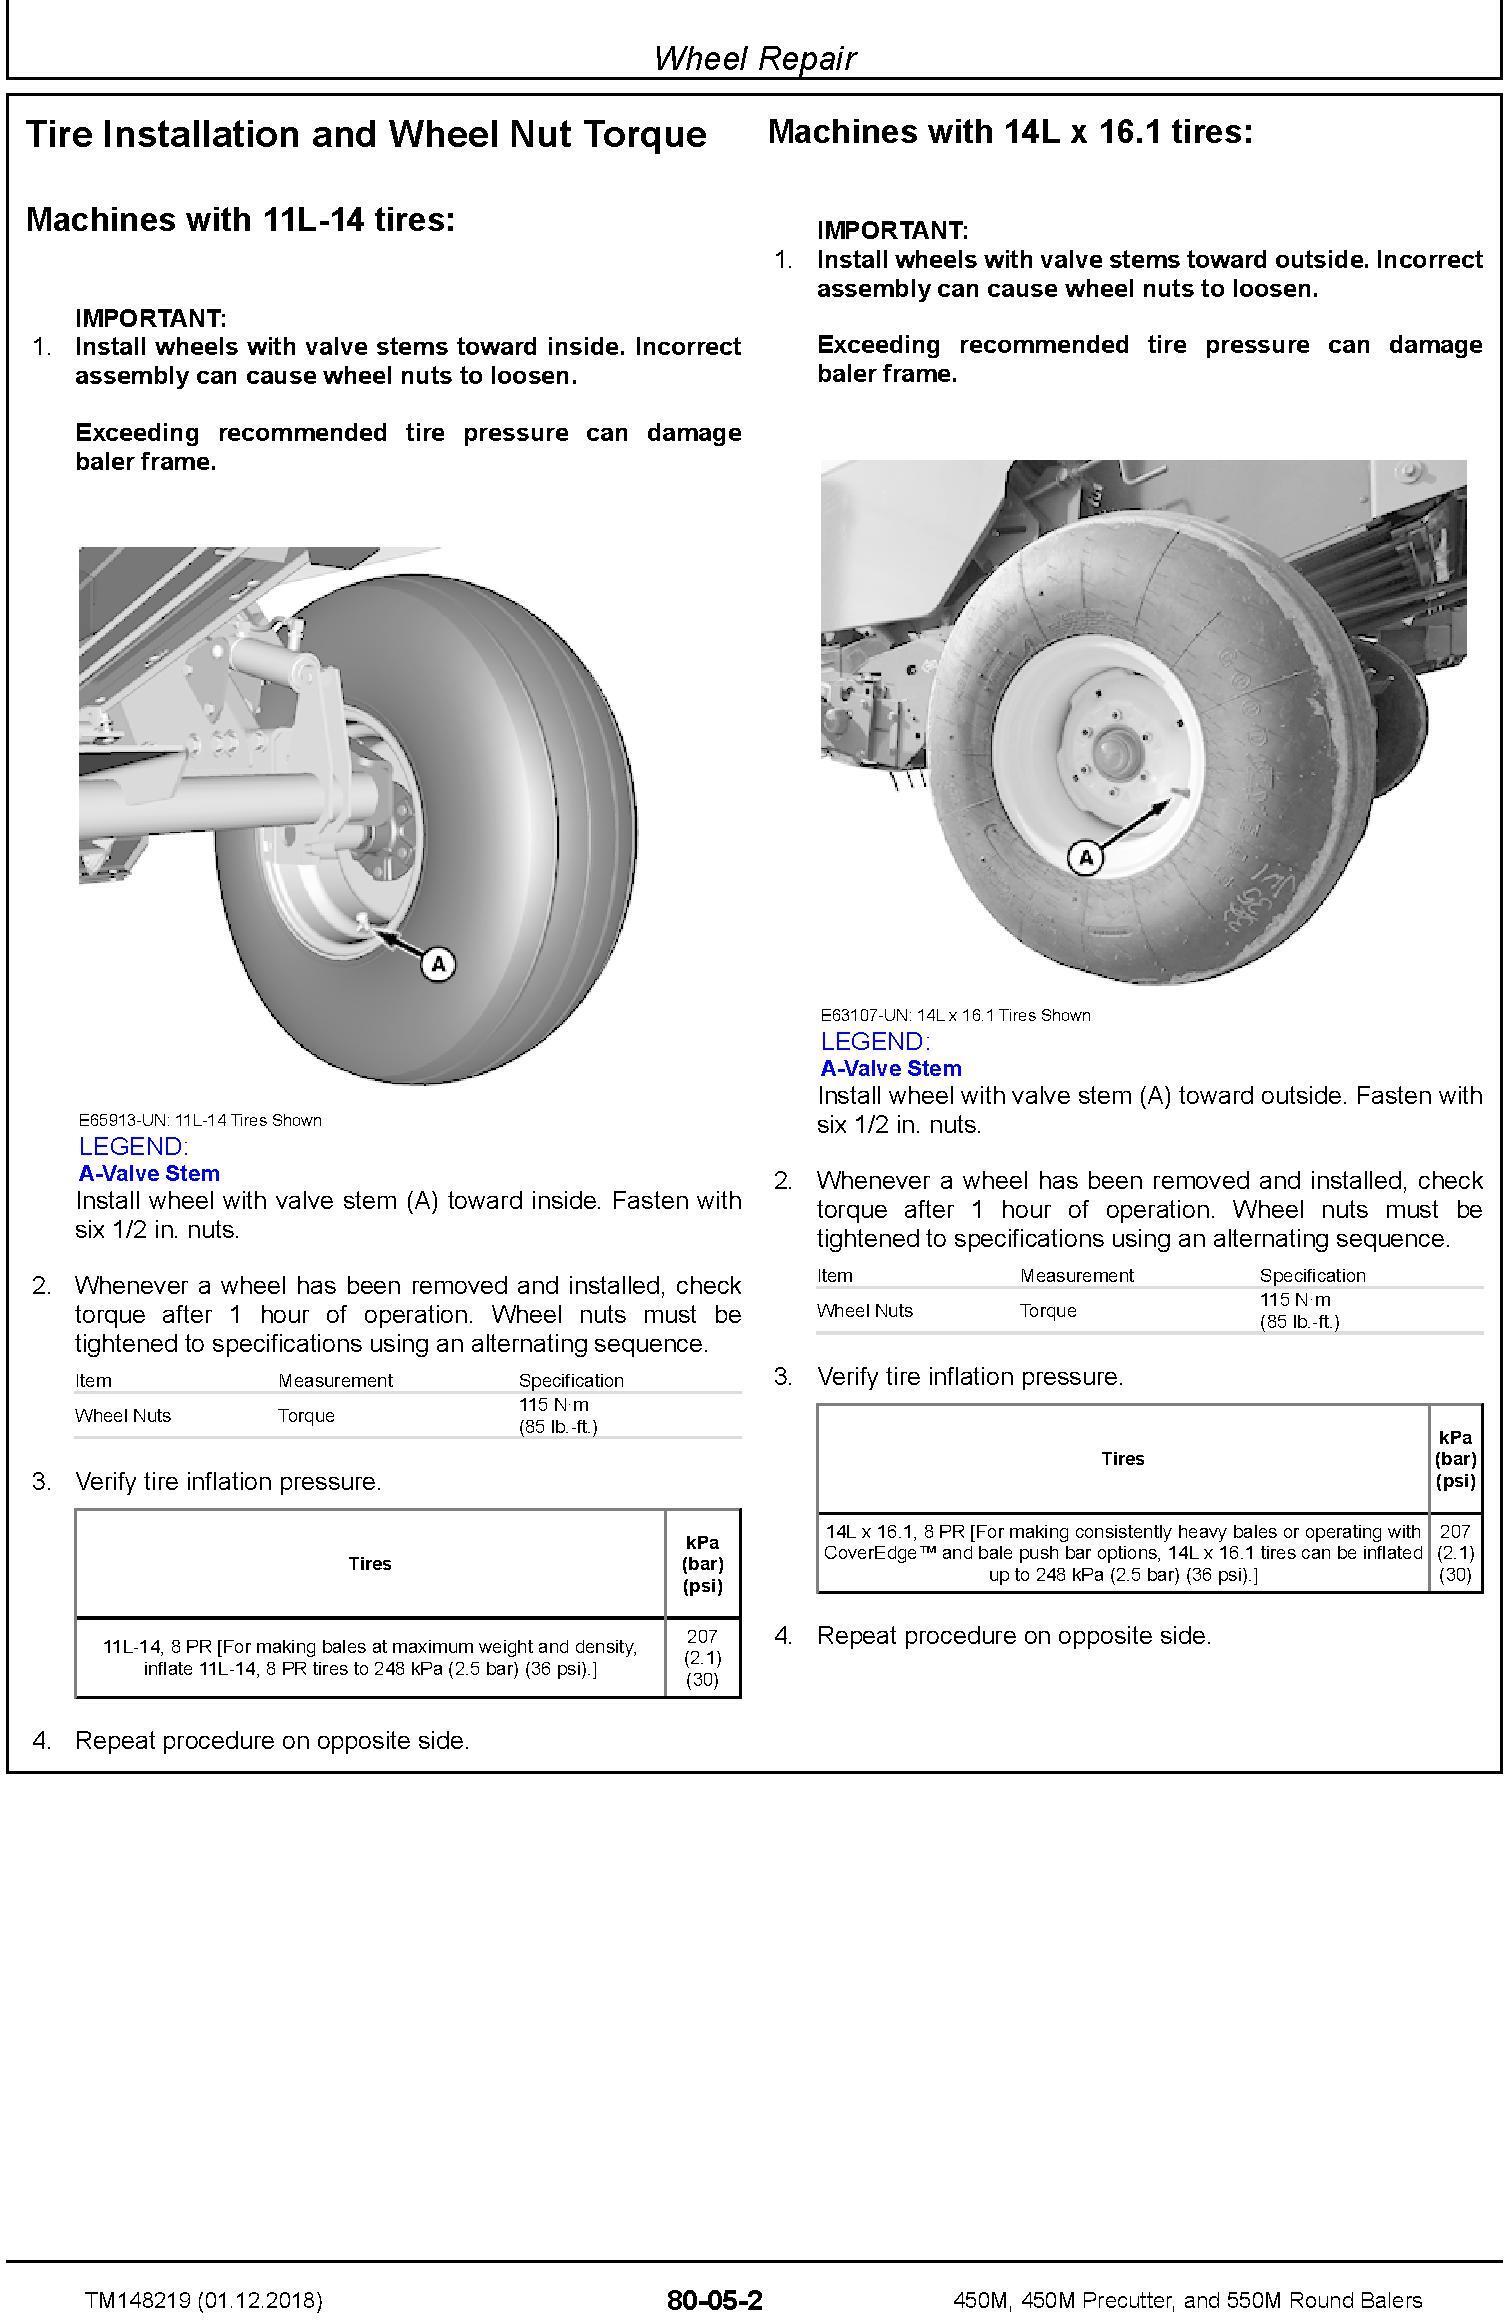 John Deere 450M, 450M Precutter, and 550M Round Balers Technical Service Manual (TM148219) - 3